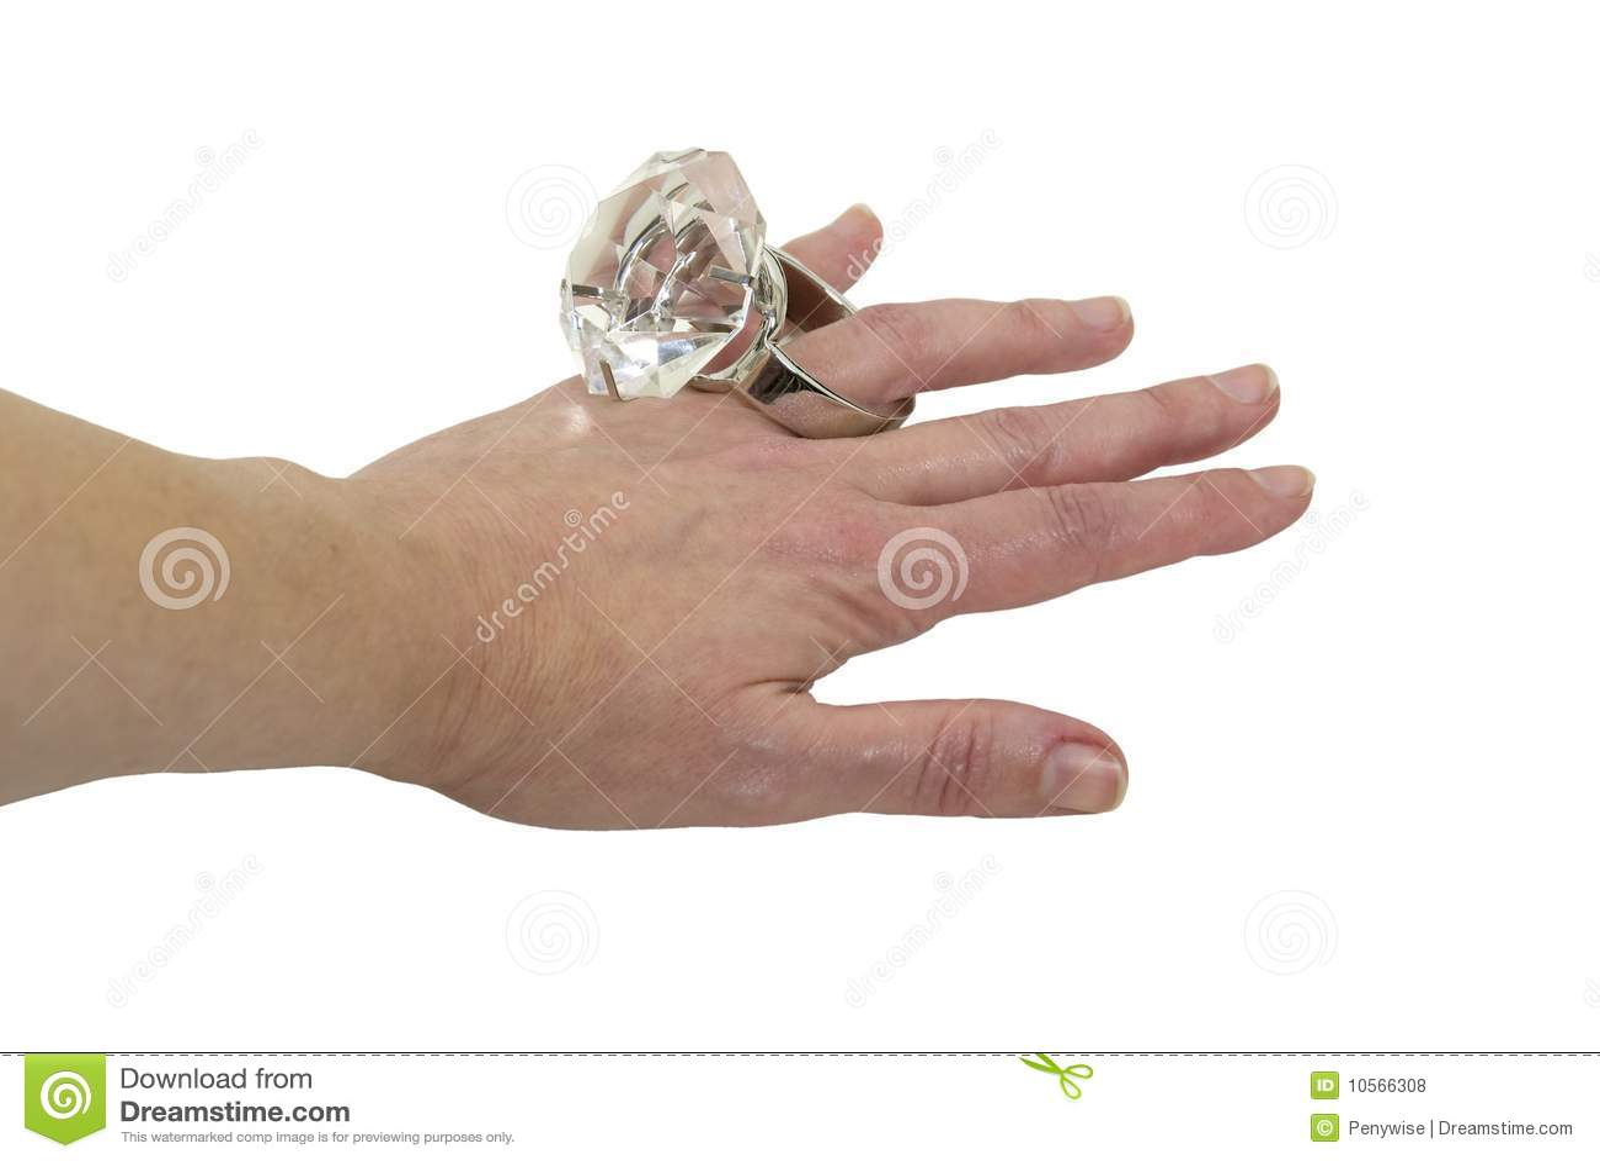 big diamond engagement ring royalty free stock photos